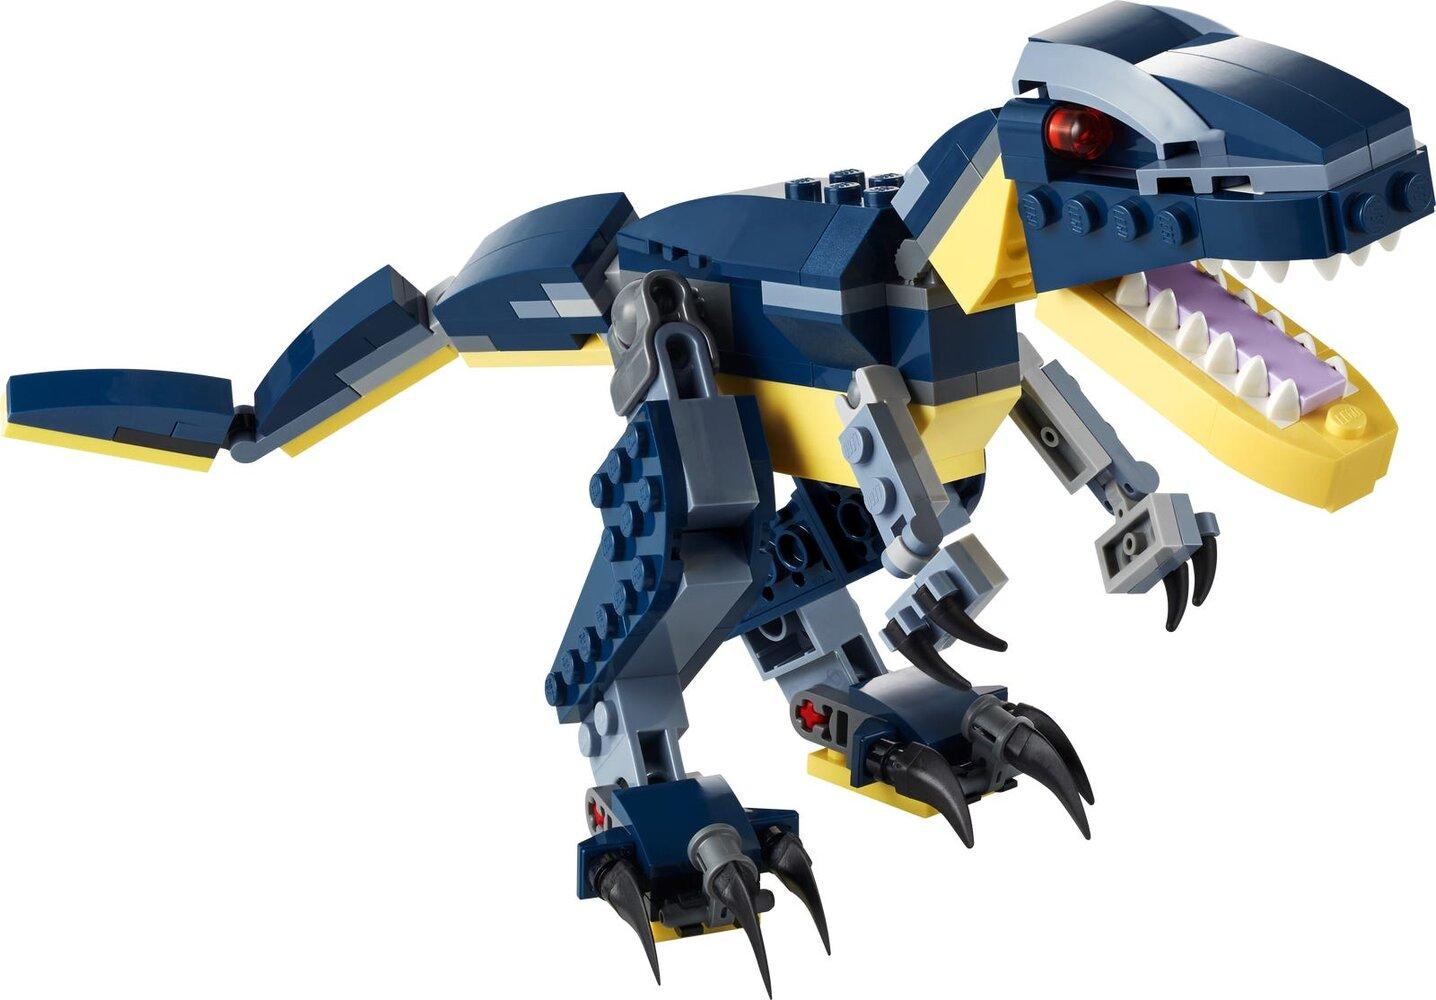 Mighty Dinosaurs - Blue Version